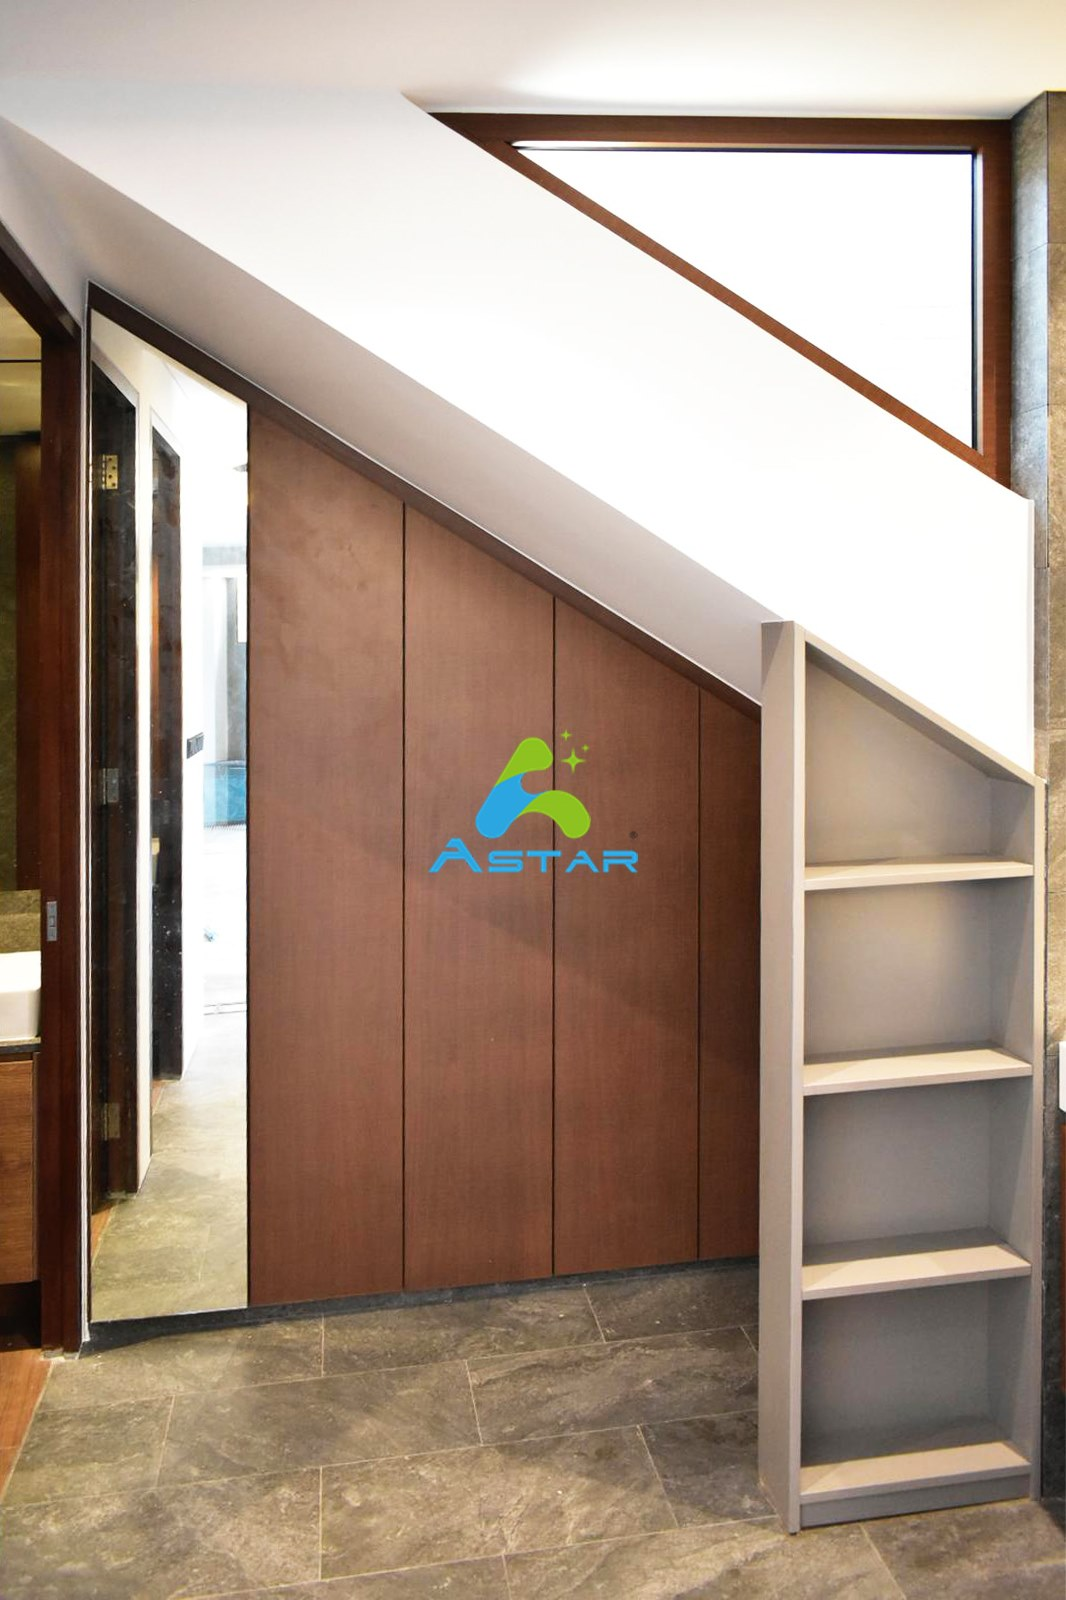 astar furnishing complete projects aluminium kitchen cabinet vanity cabinet wardrobe gardenia road 11